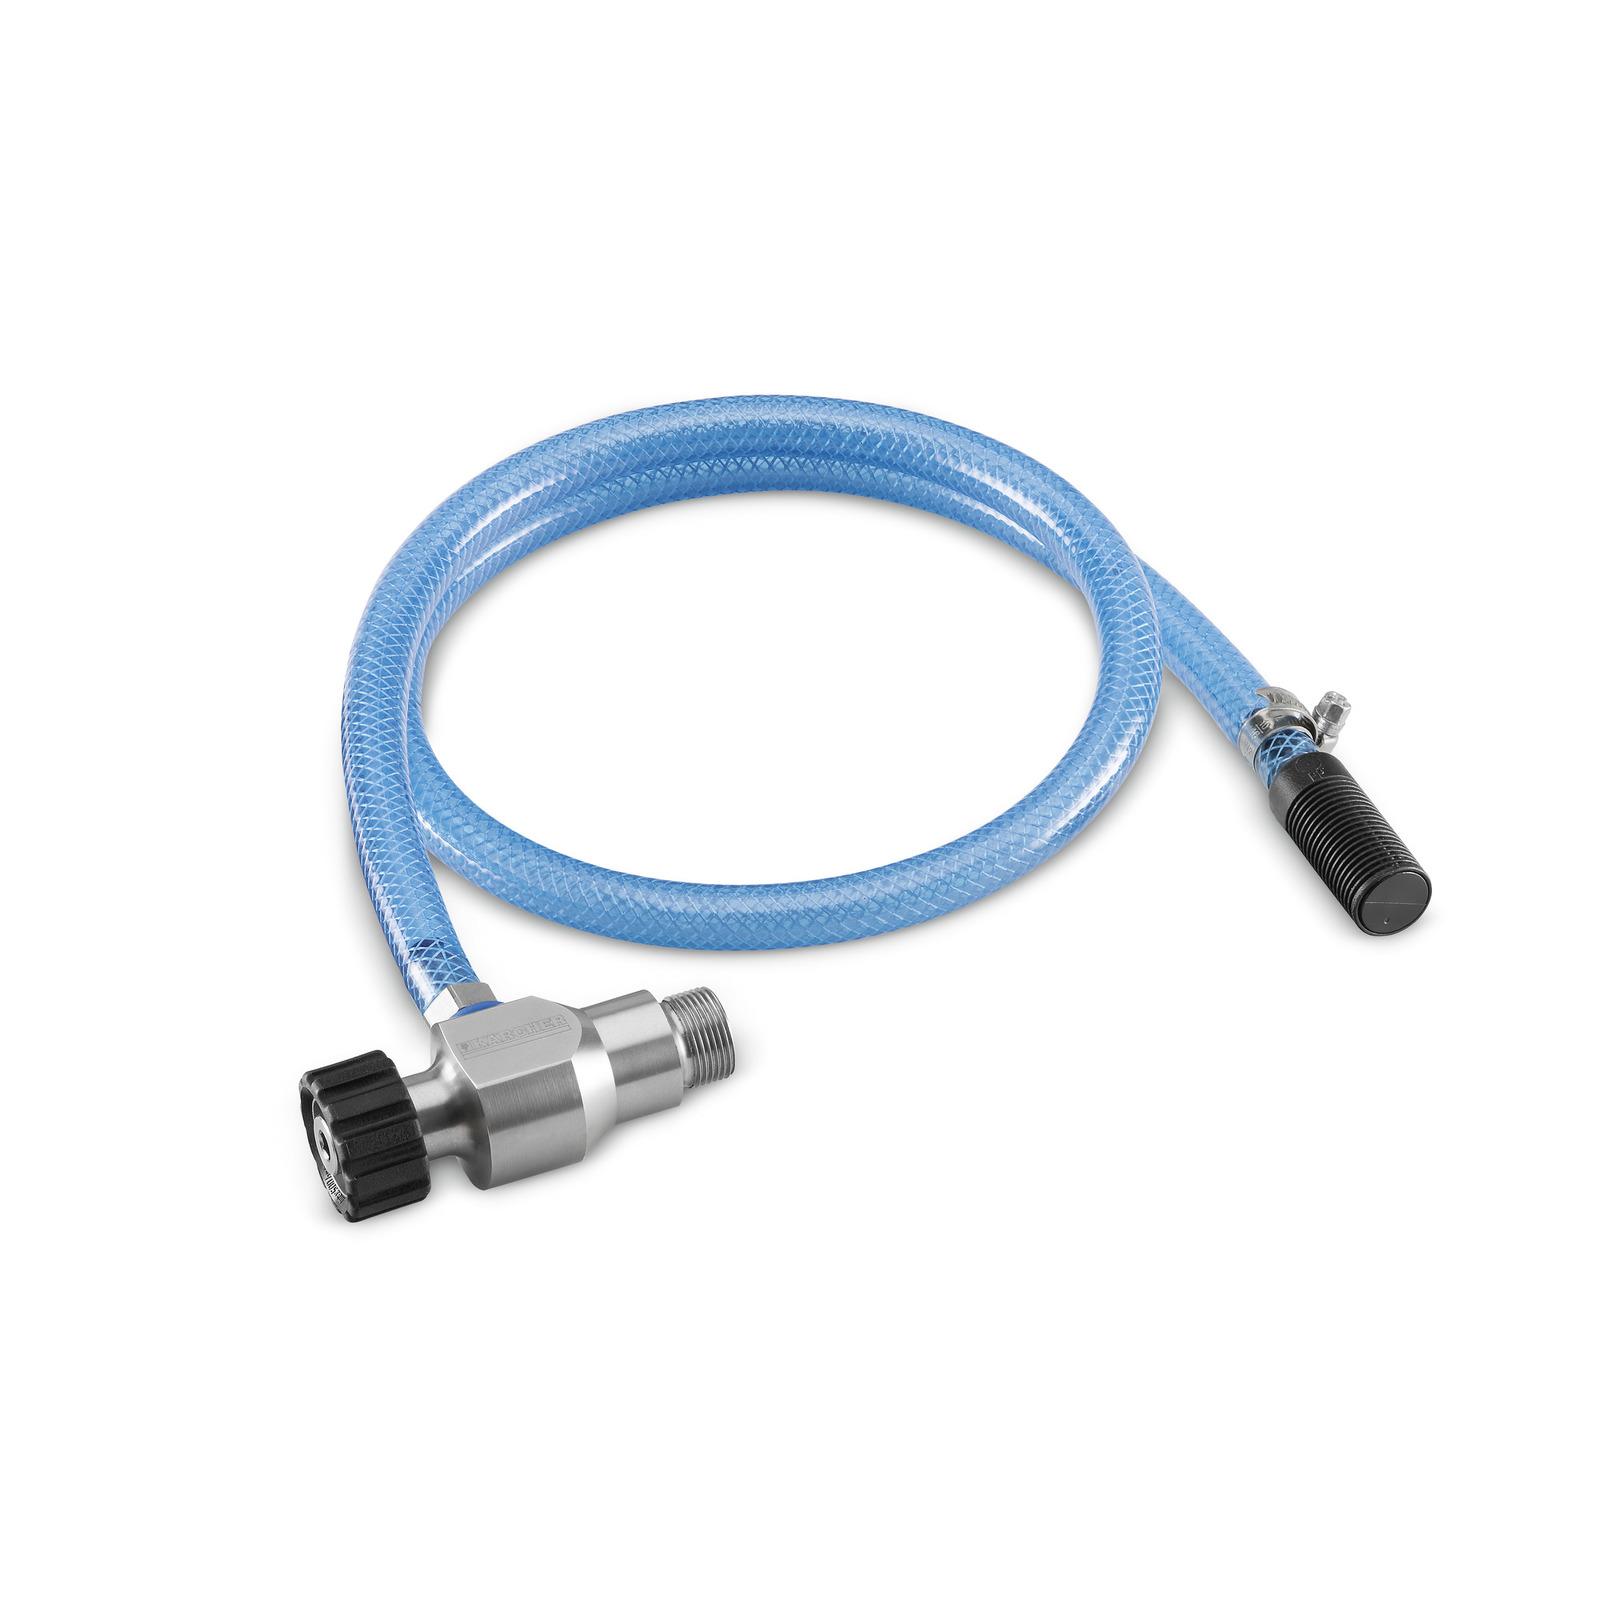 Edelstahl-Injektor Kit für HD 10/25-4S